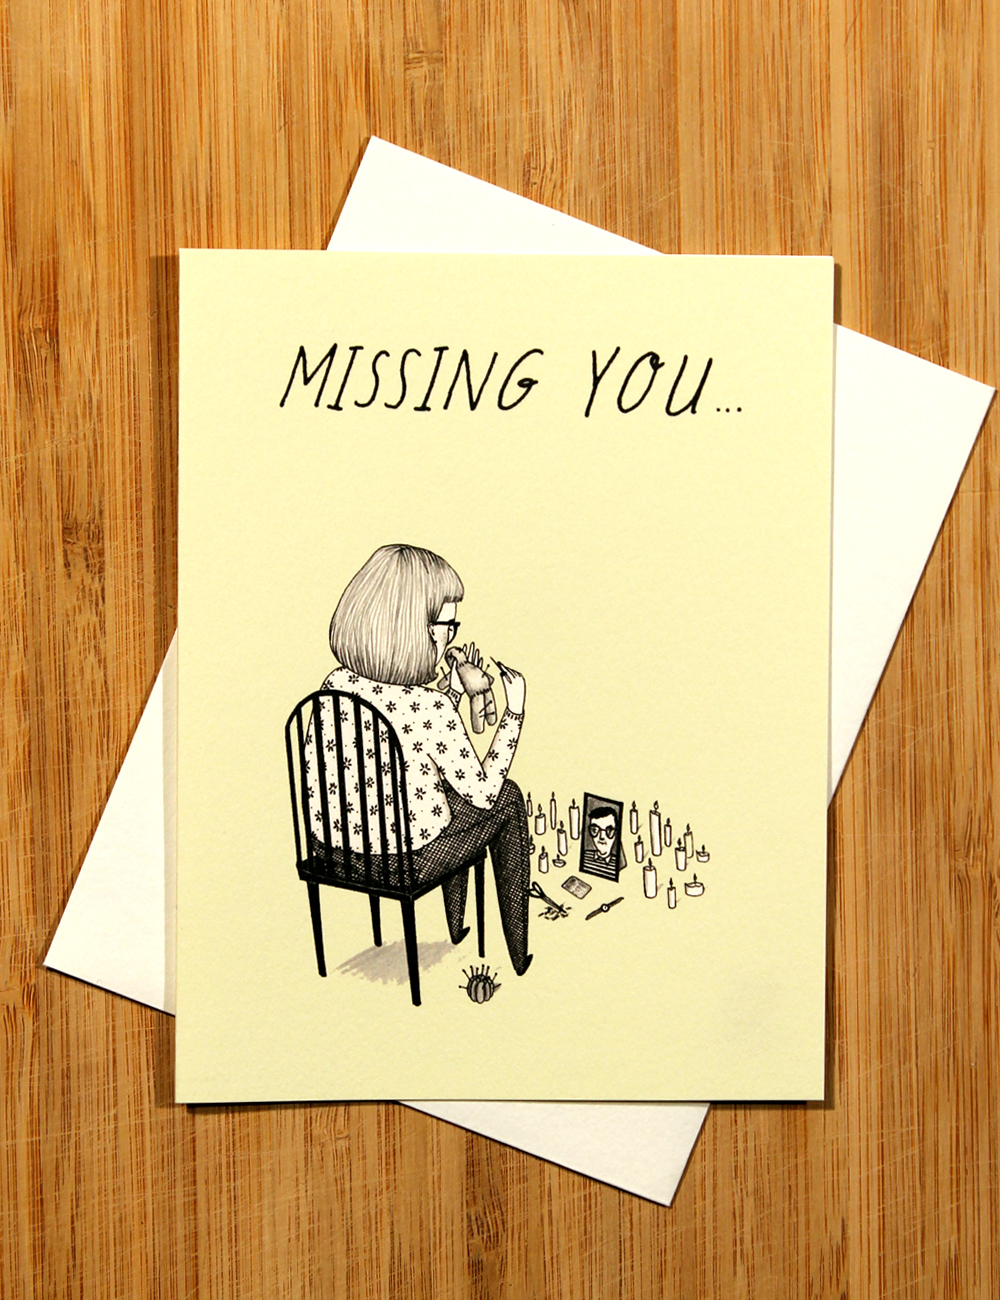 Missingyoucard.jpg